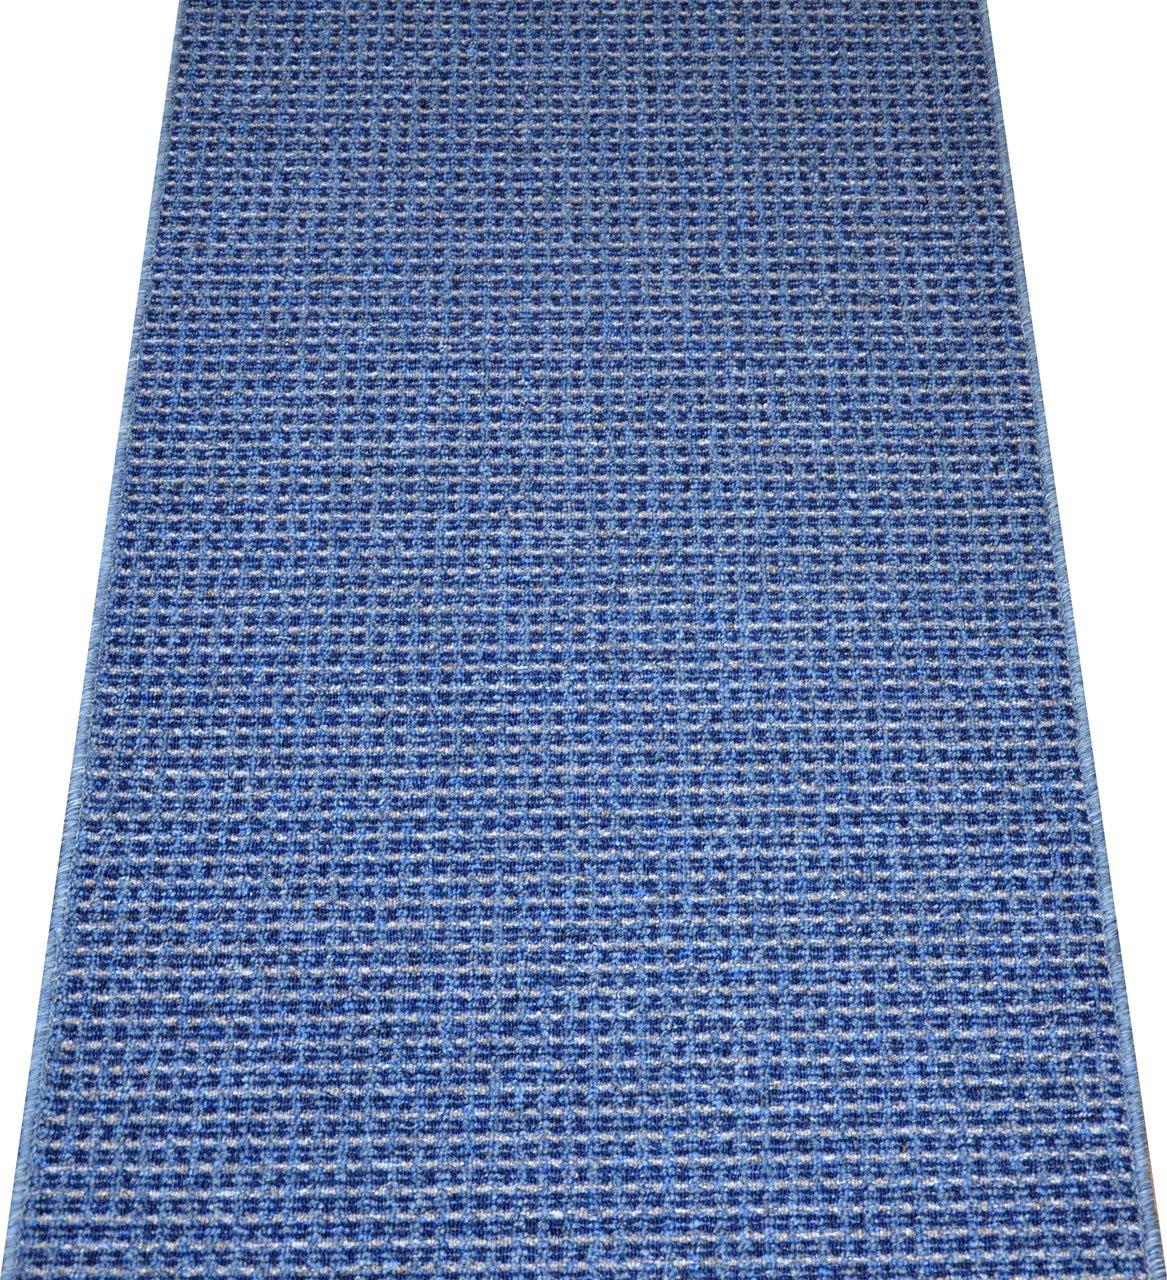 Washable Non Skid Carpet Rug Runner Michelle Blue 5